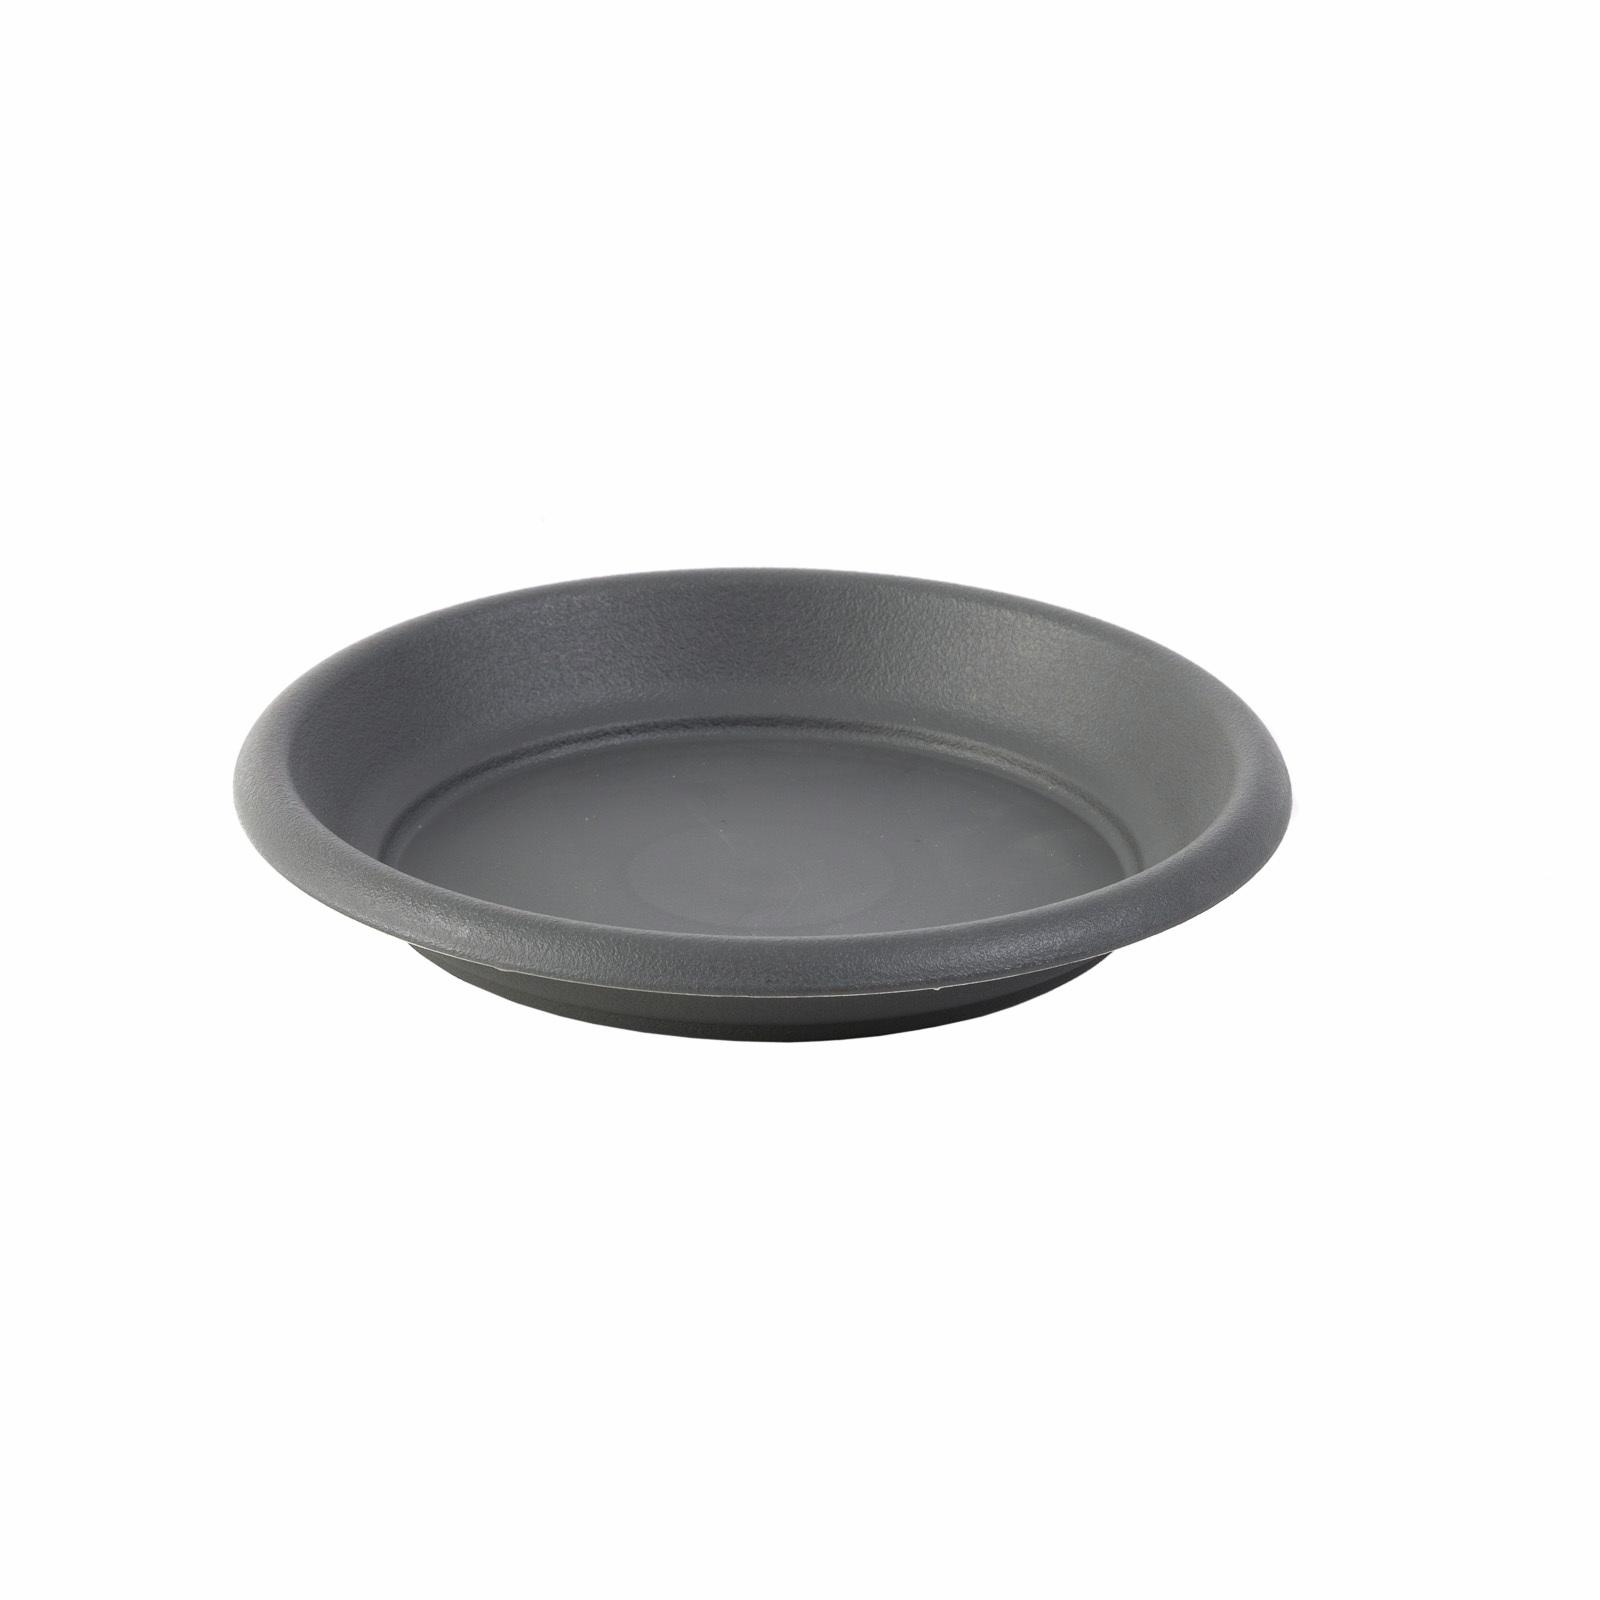 Northcote Pottery Graphite Villa Round Plastic Saucer - 150mm